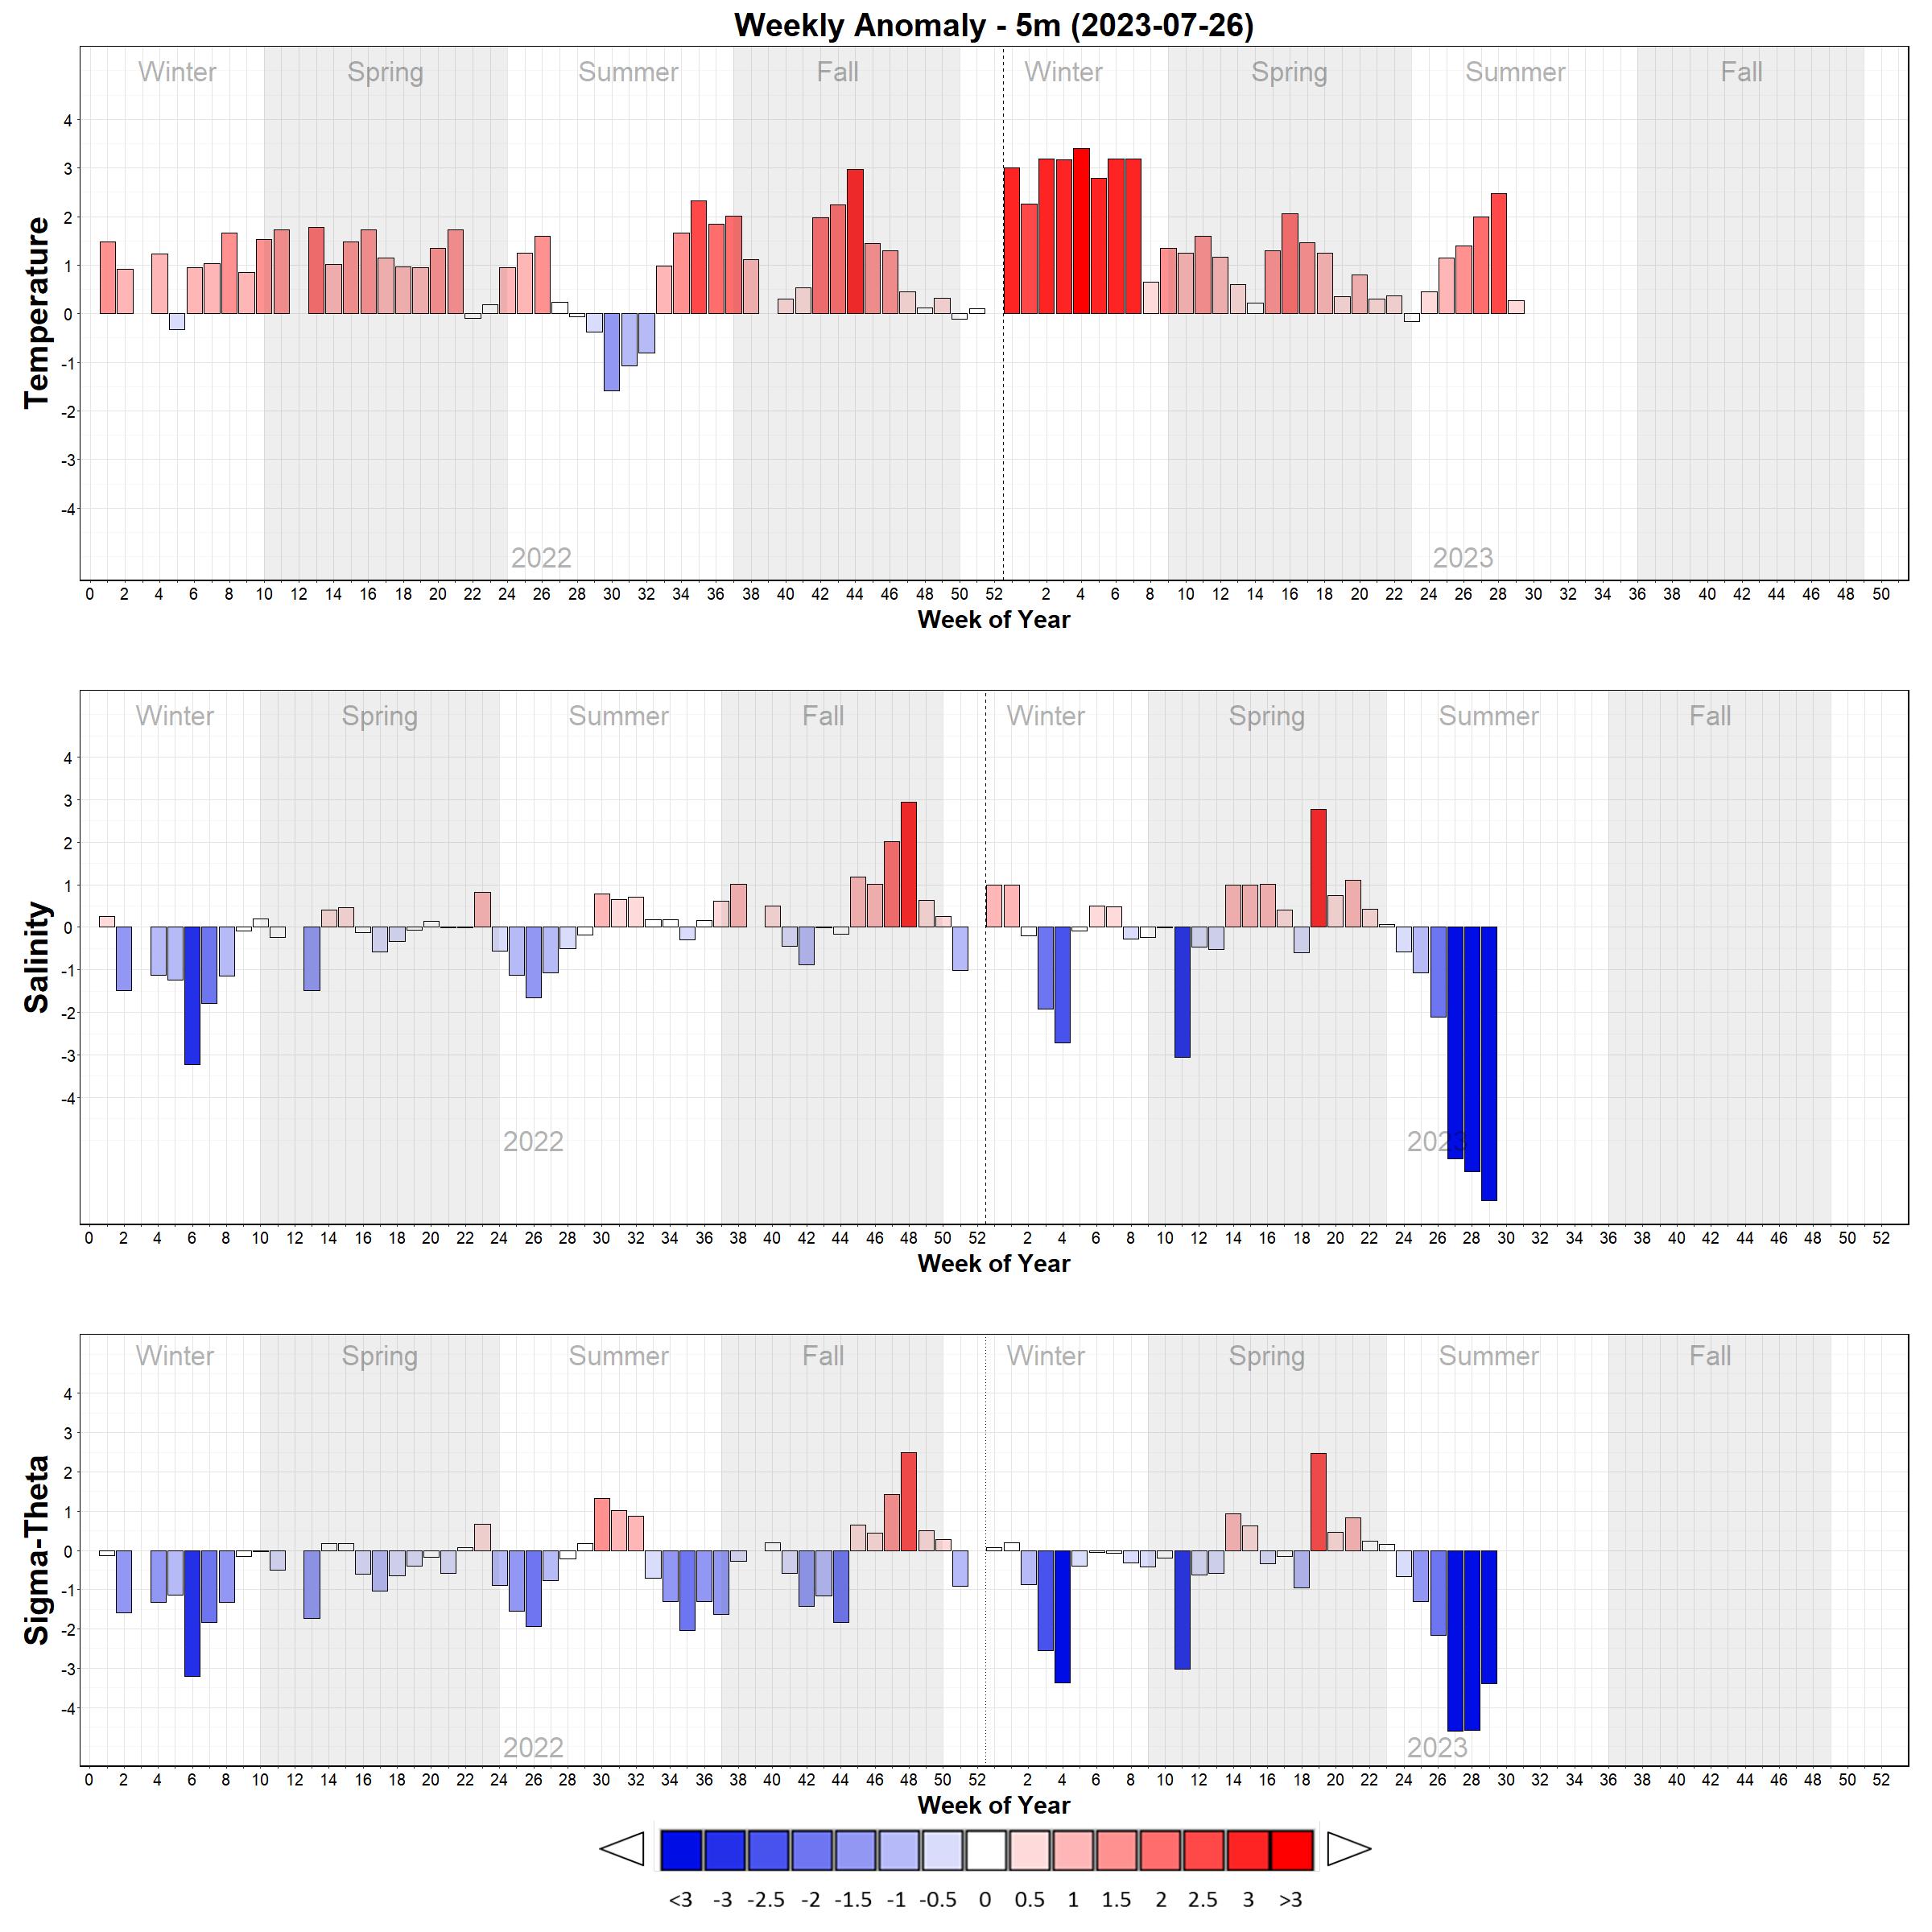 Temperature and Salinity Weekly Anomaly Bar Plots - 5m